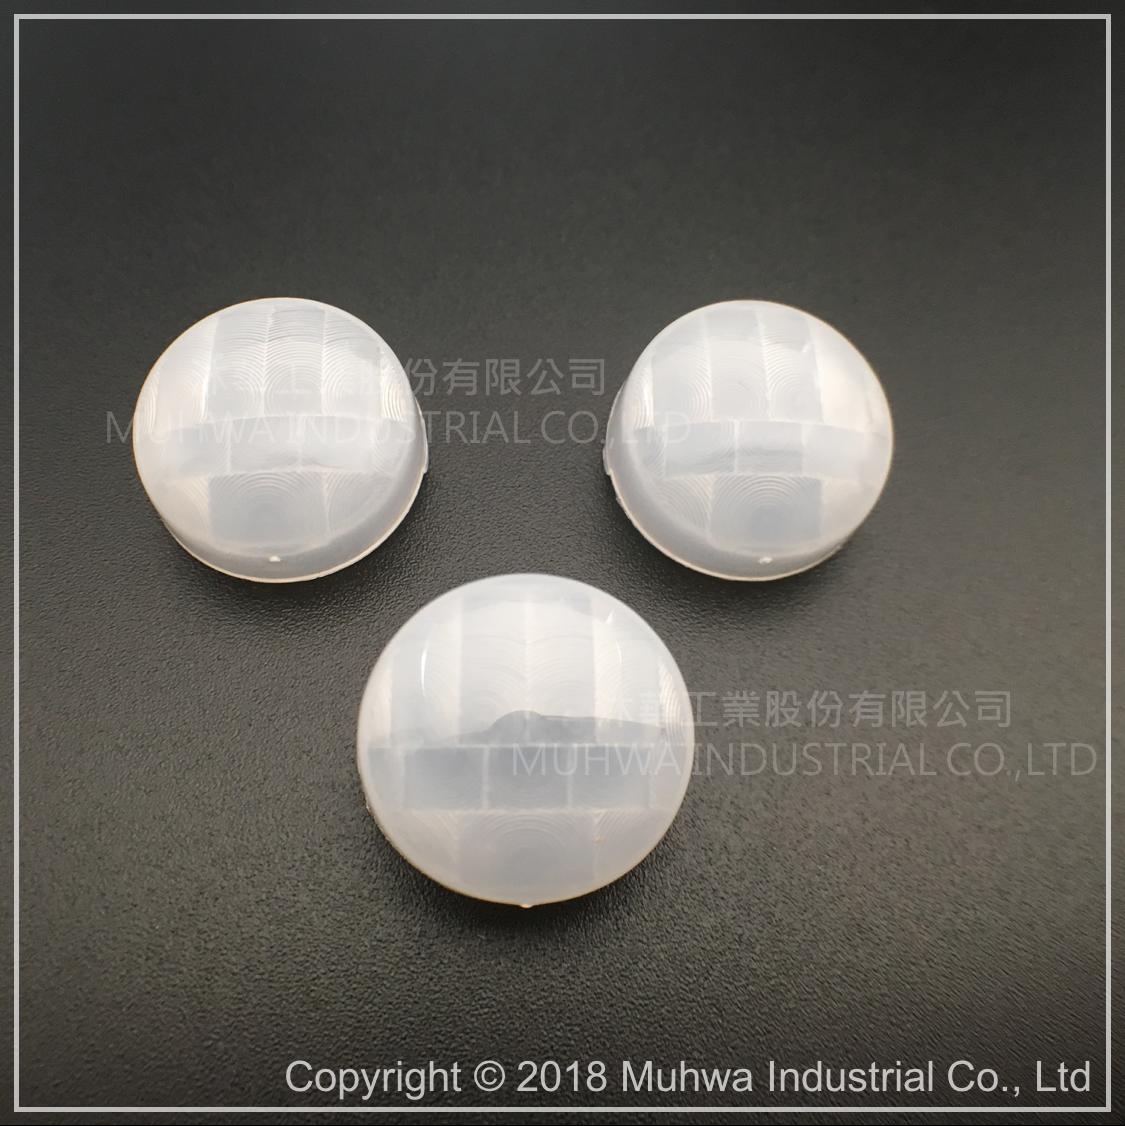 High quality Fresnel Lens Of Sensor Module Quotes,China Fresnel Lens Of Sensor Module Factory,Fresnel Lens Of Sensor Module Purchasing